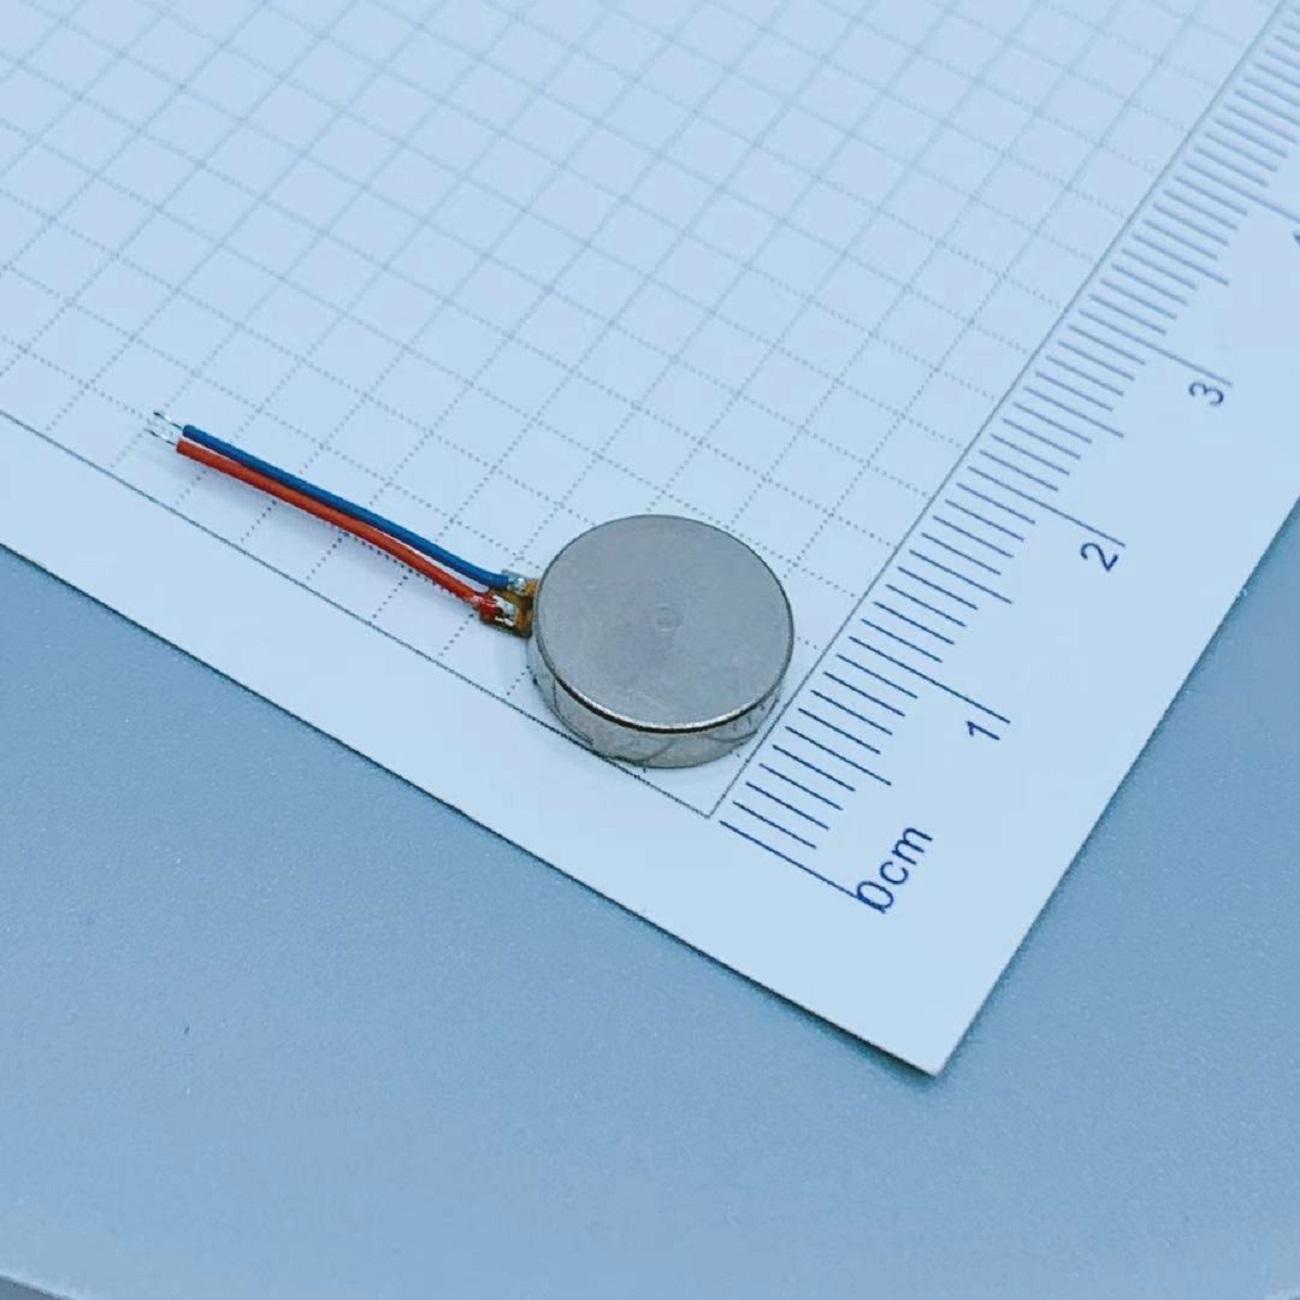 Dia 10mm*2.7mm Micro Vibration Motors | Miniature Space Pancakes | LEADER LCM-1027